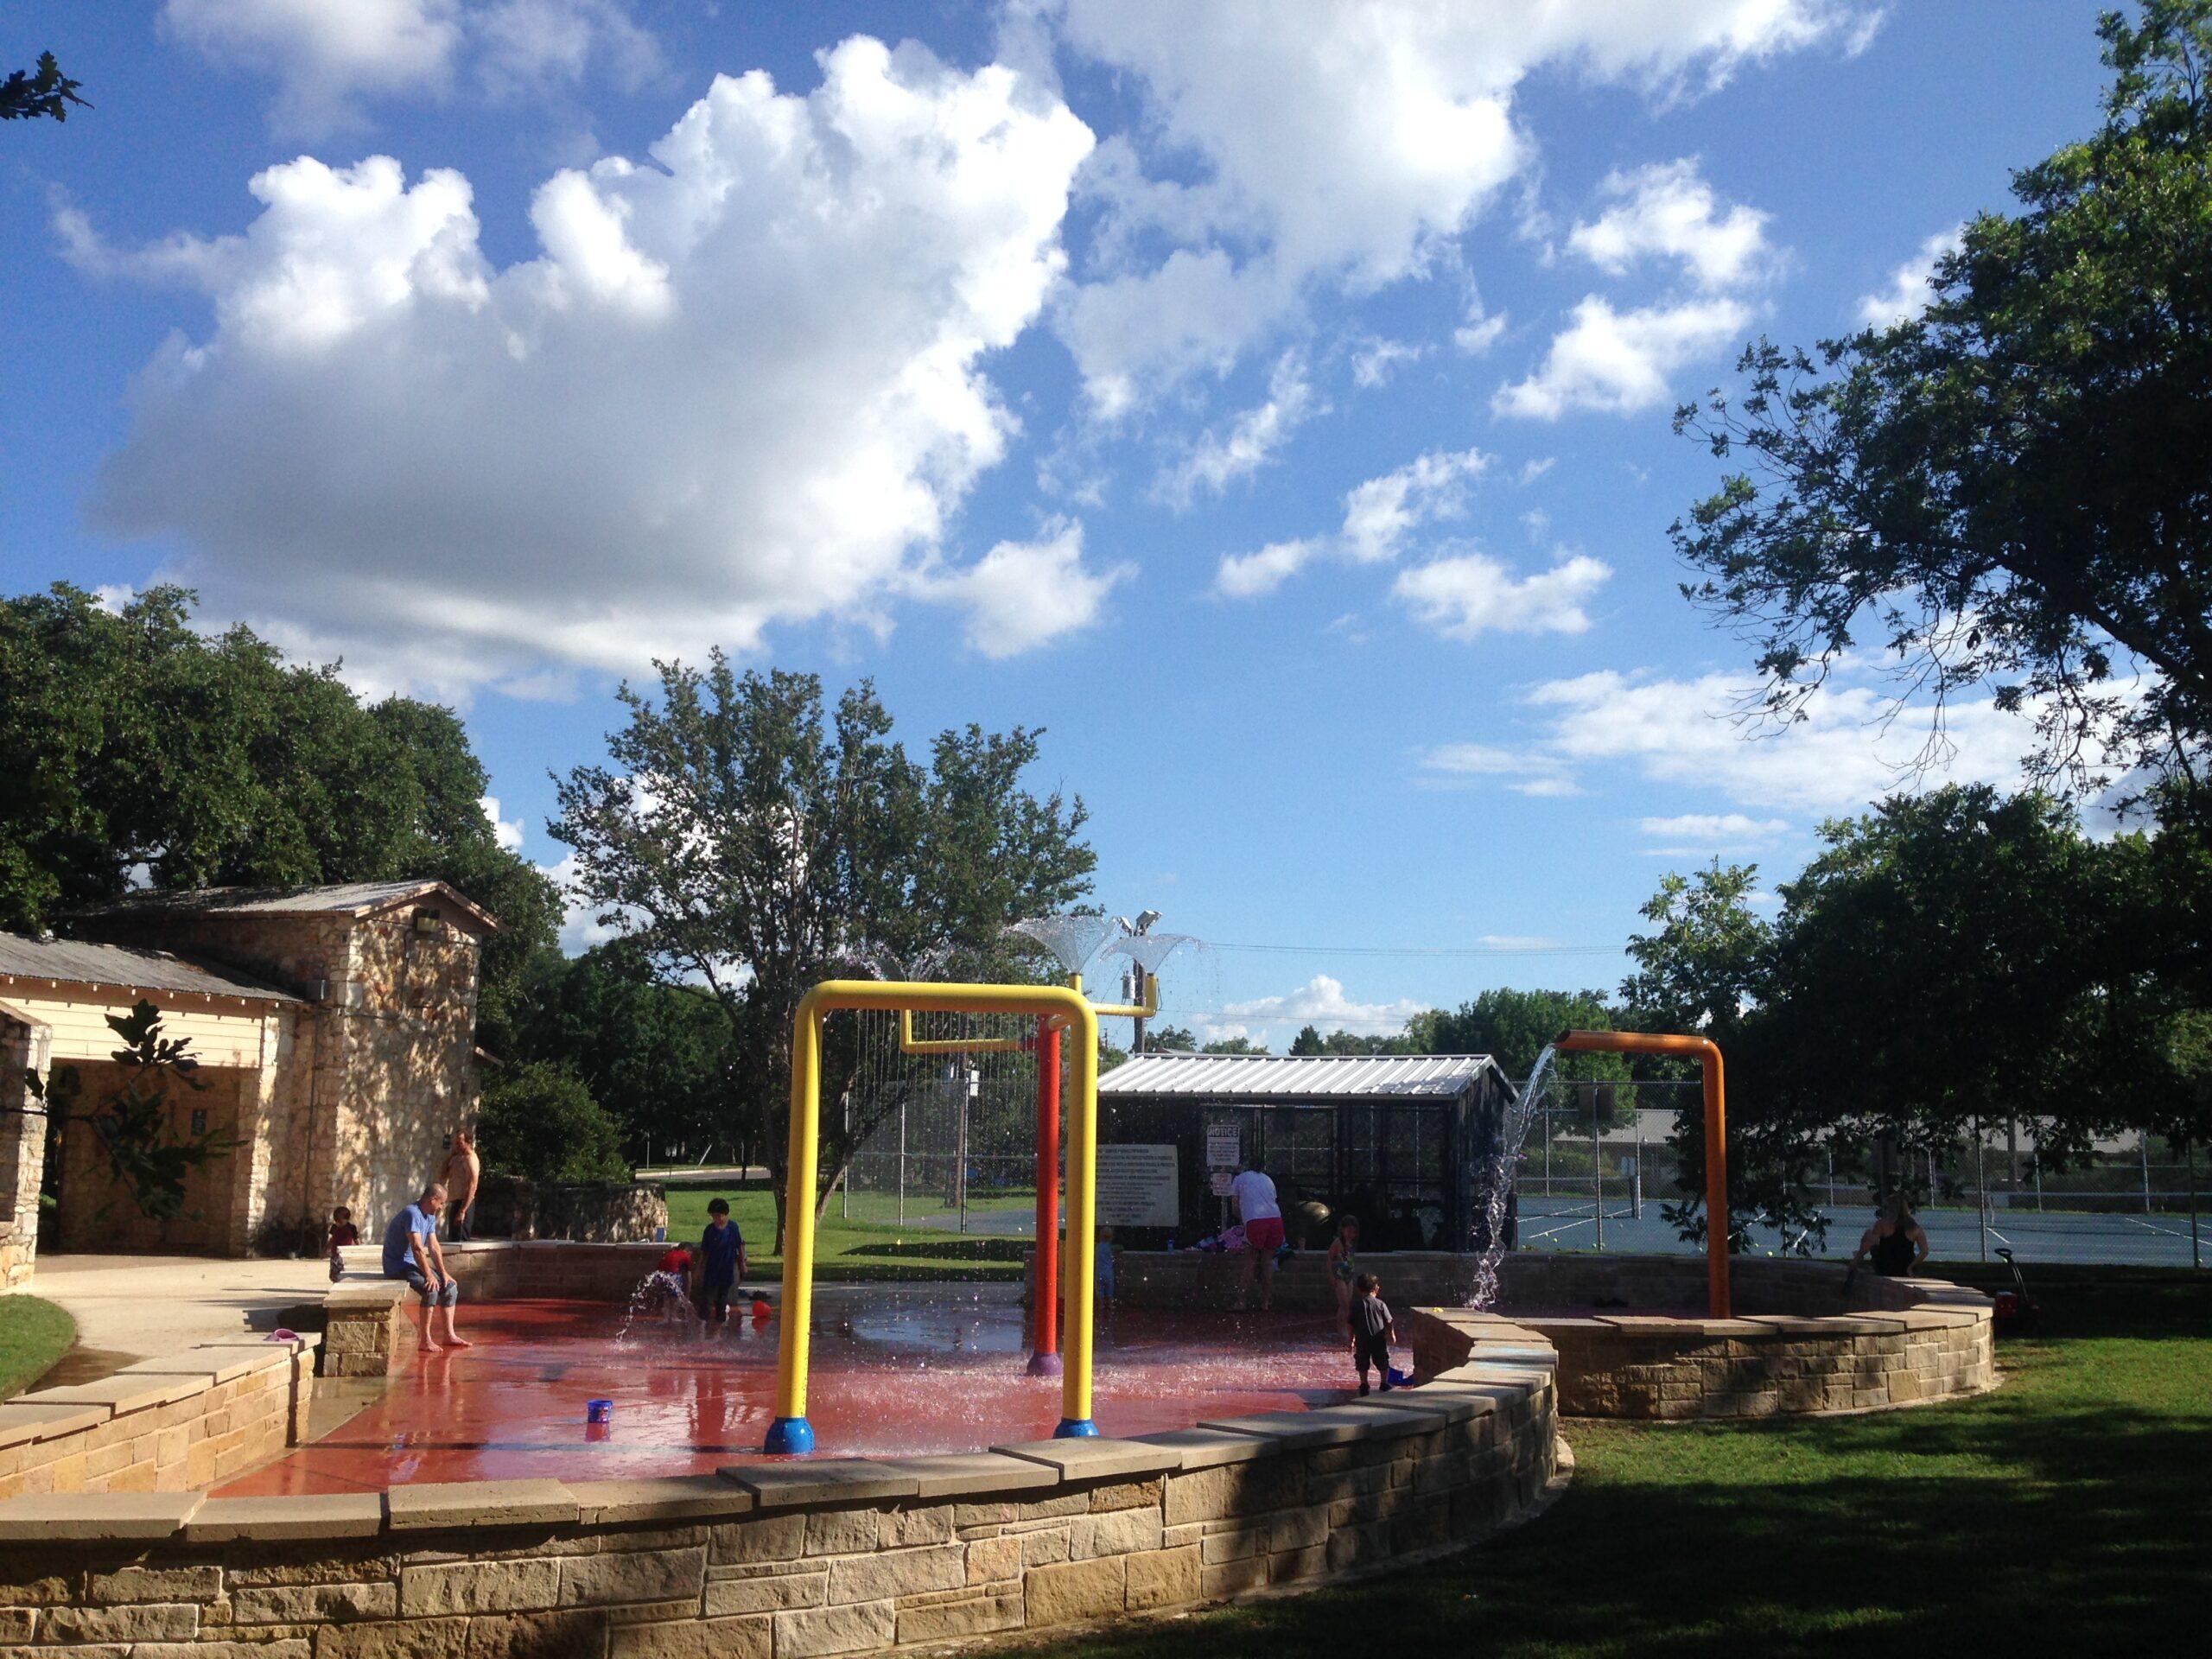 Bailey Park Splash Pad in Austin, Texas